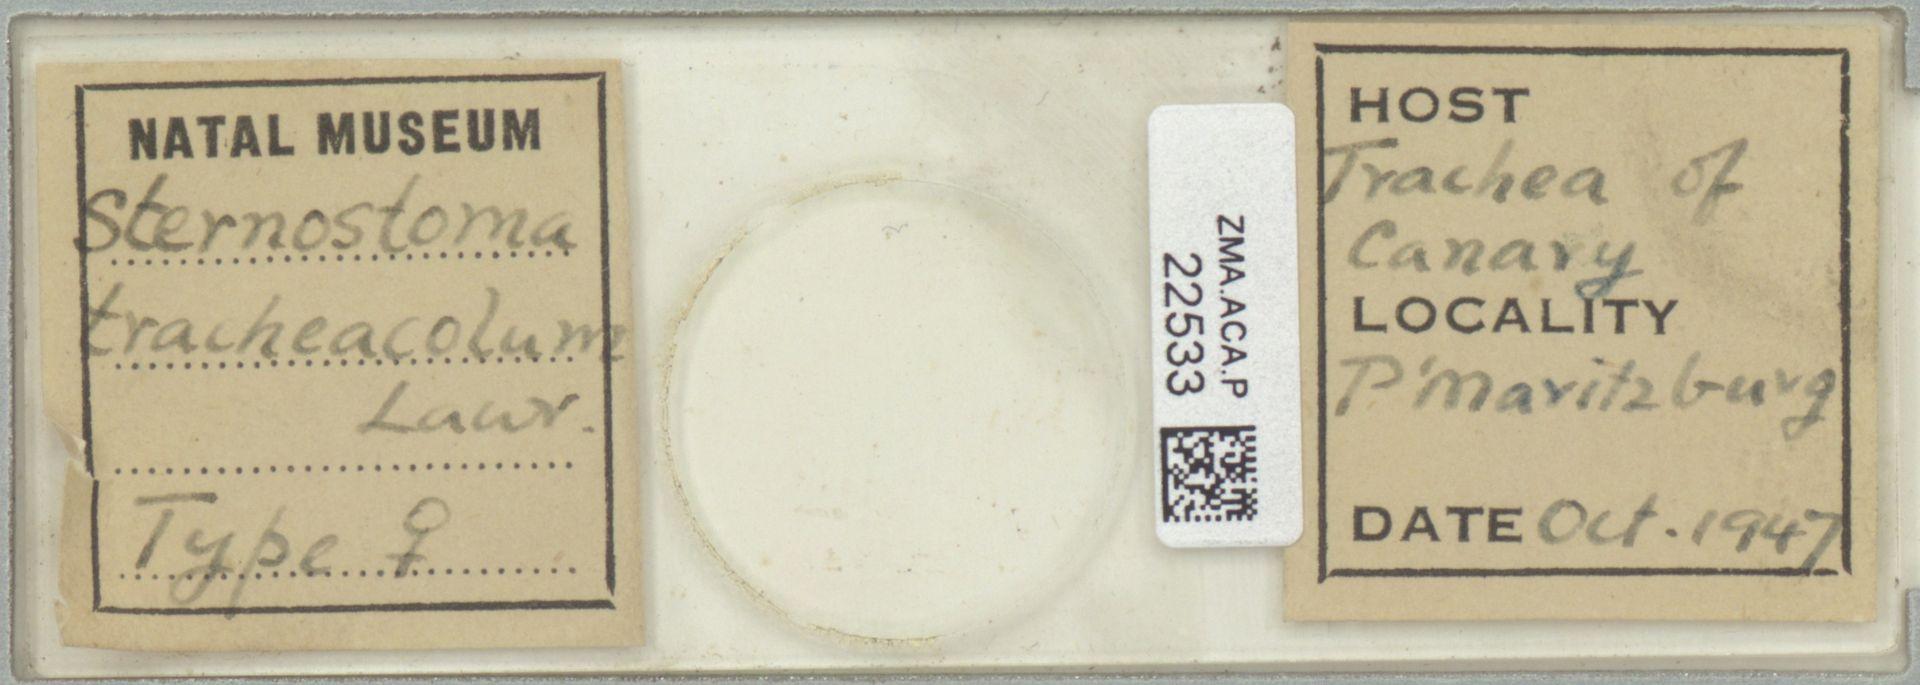 ZMA.ACA.P.22533 | Sternostoma tracheacolum